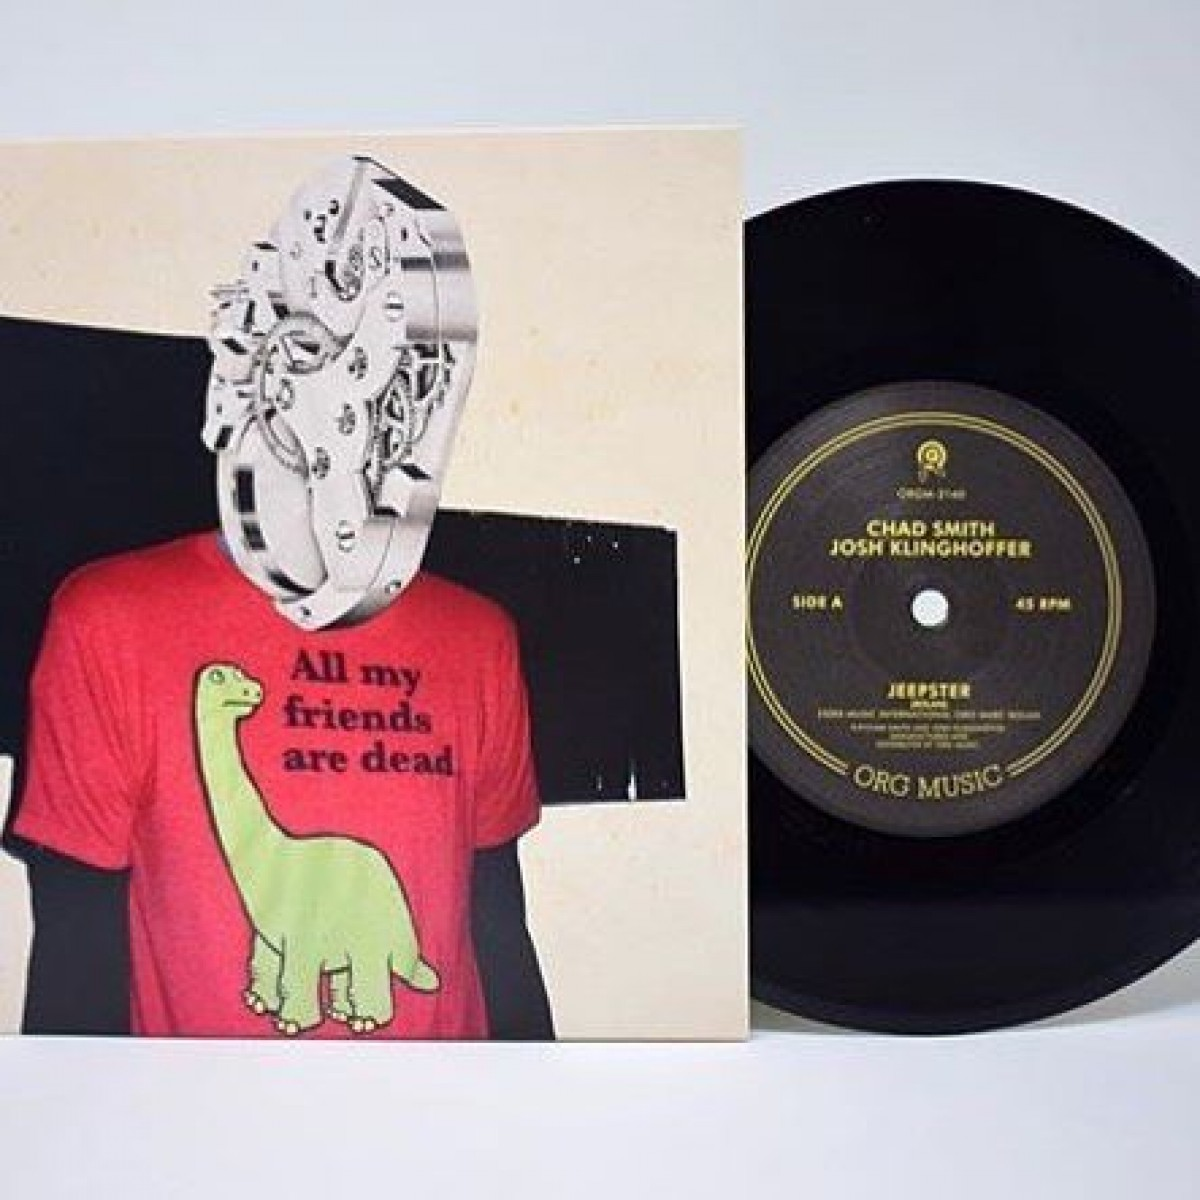 Vinyle Chad Smith & Josh Klinghoffer 